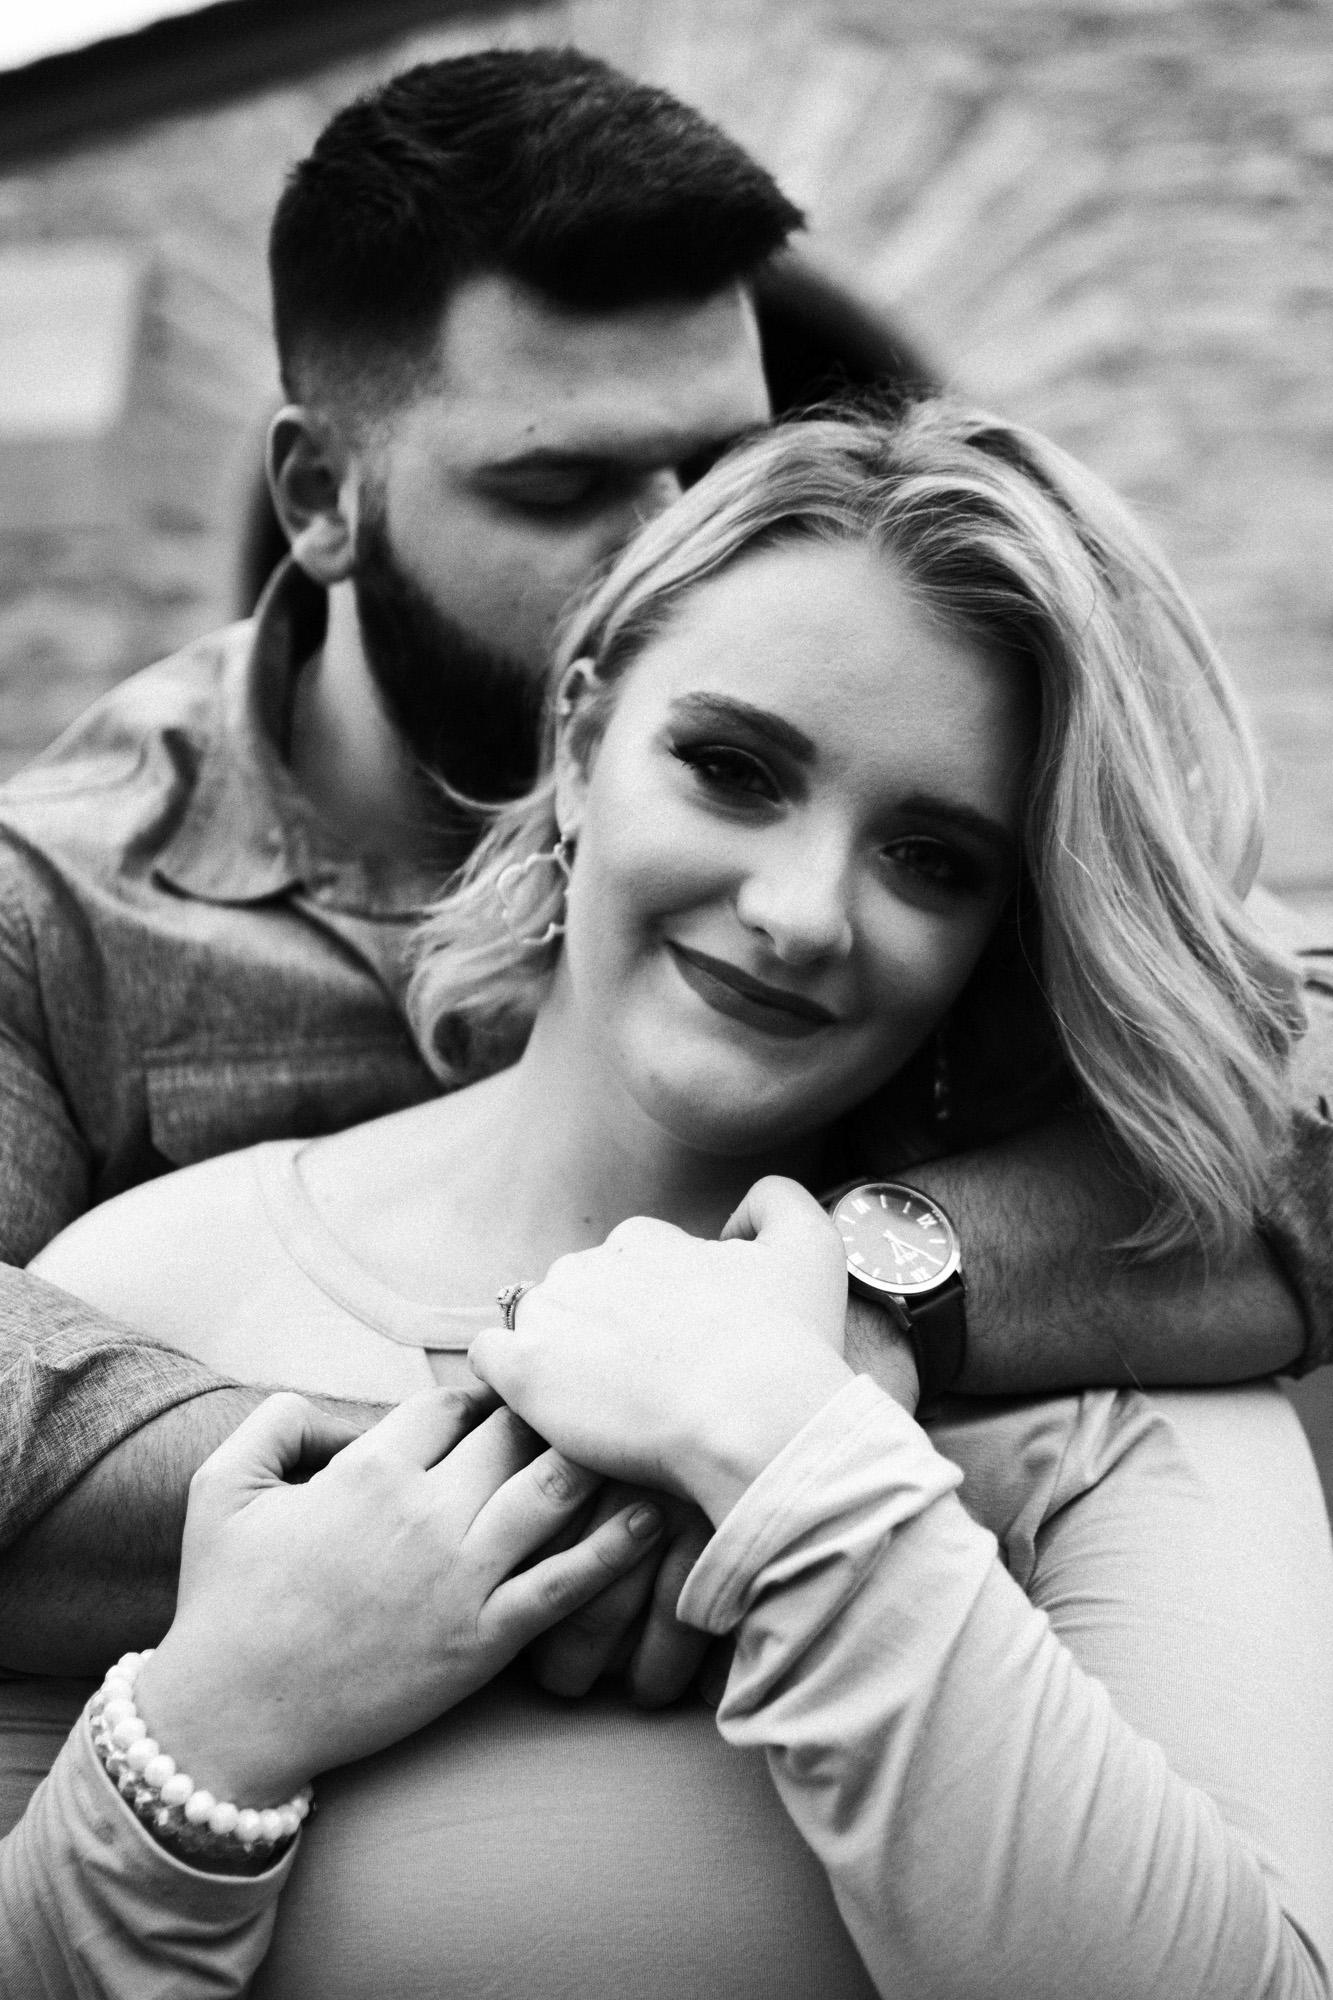 Cate_Ann_Photography_Dayton_Ohio_Wedding_And_Engagement_PhotographerDSC_2928.jpg